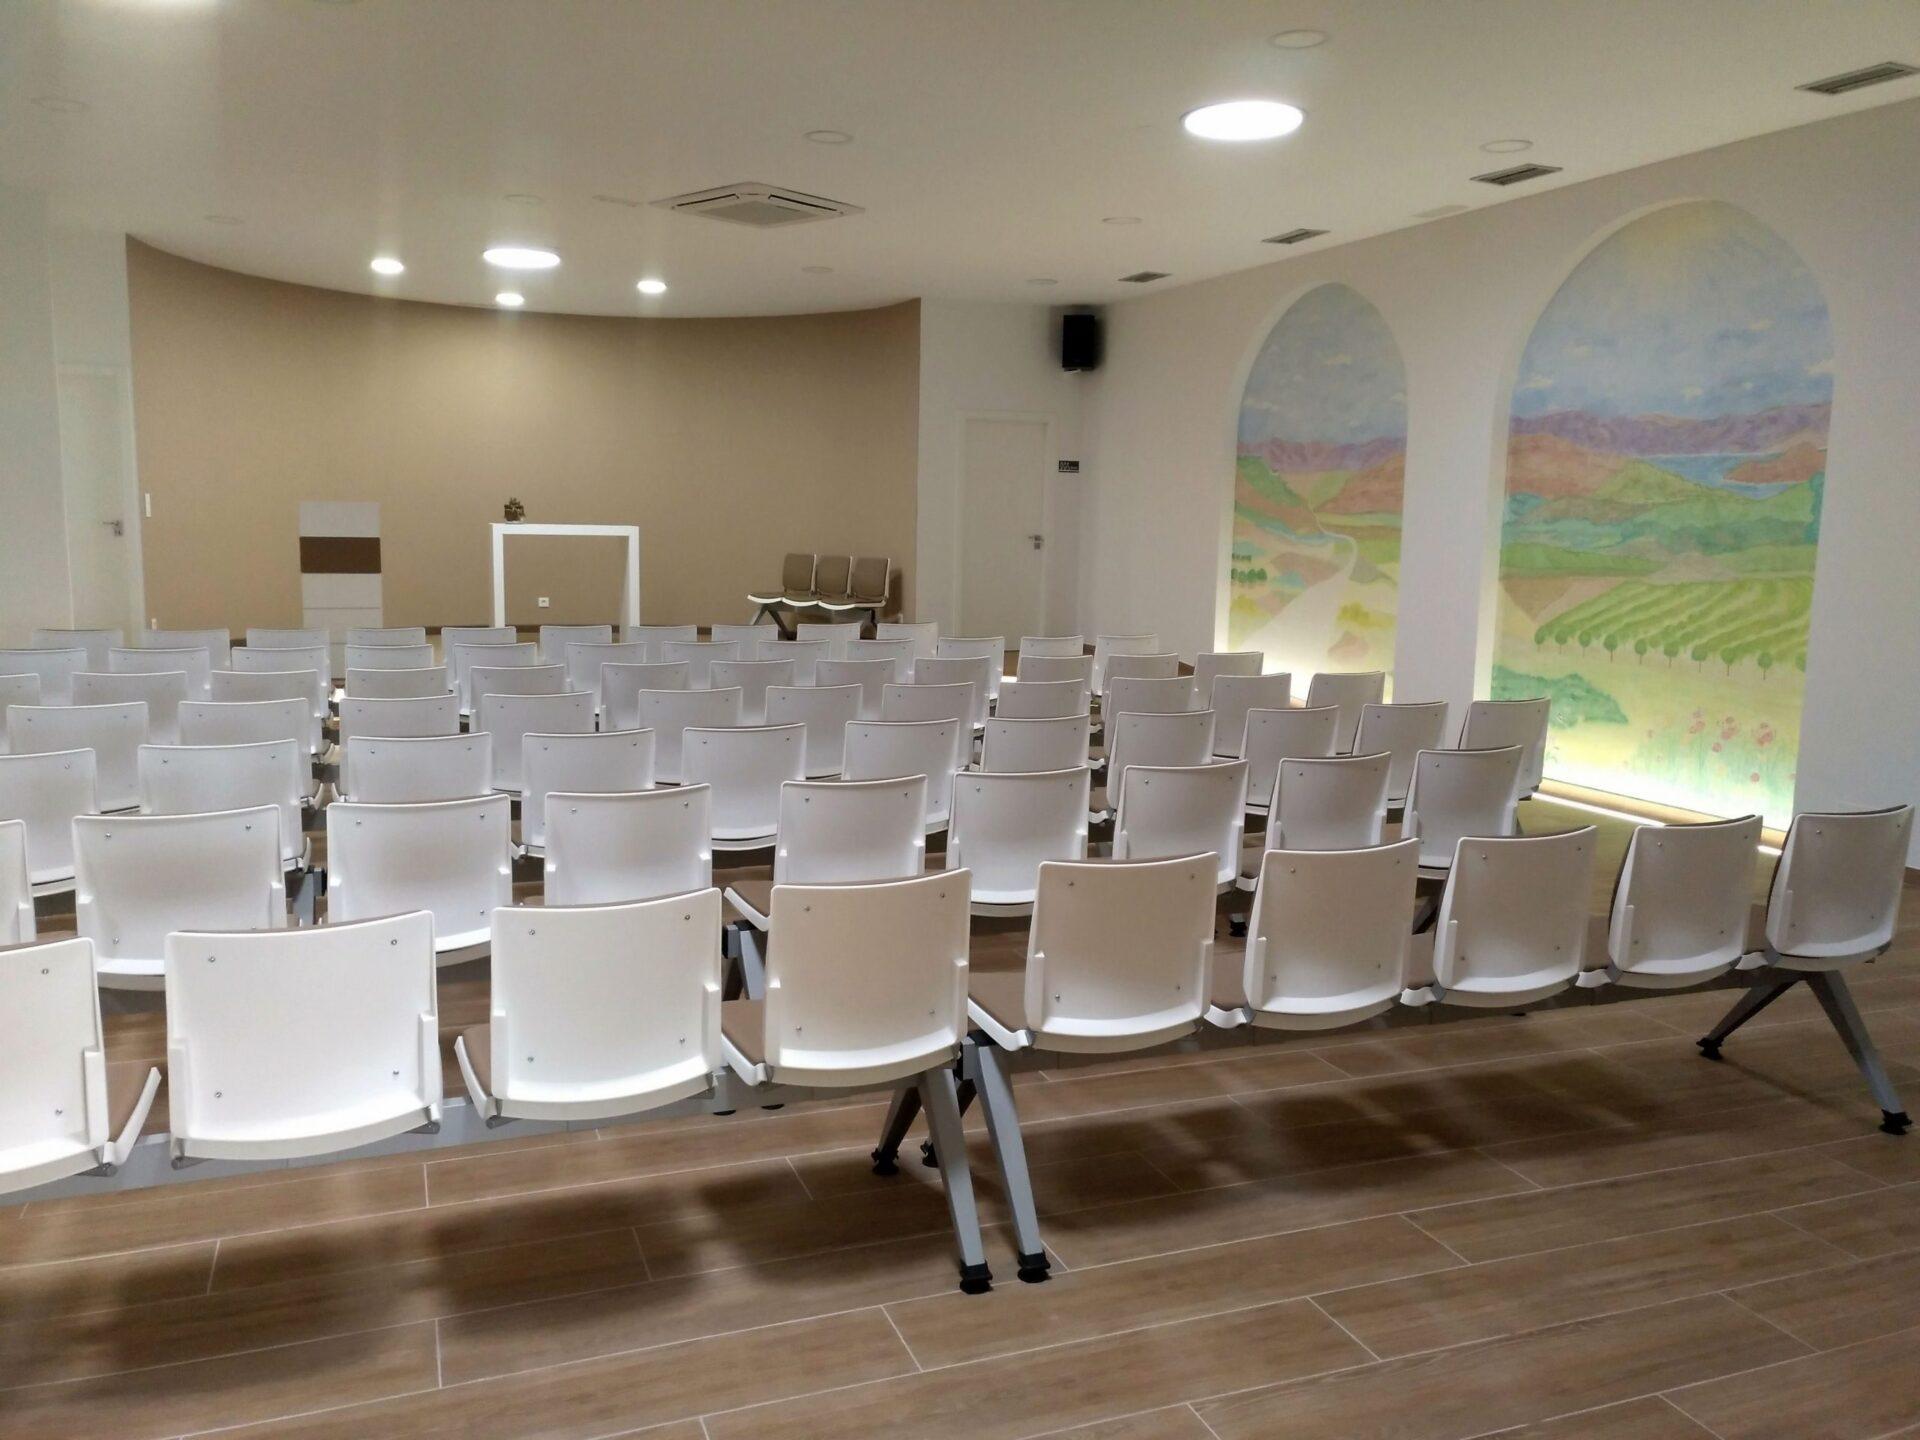 Bioconstruir | Salon De Actos Tanatorio San Martin